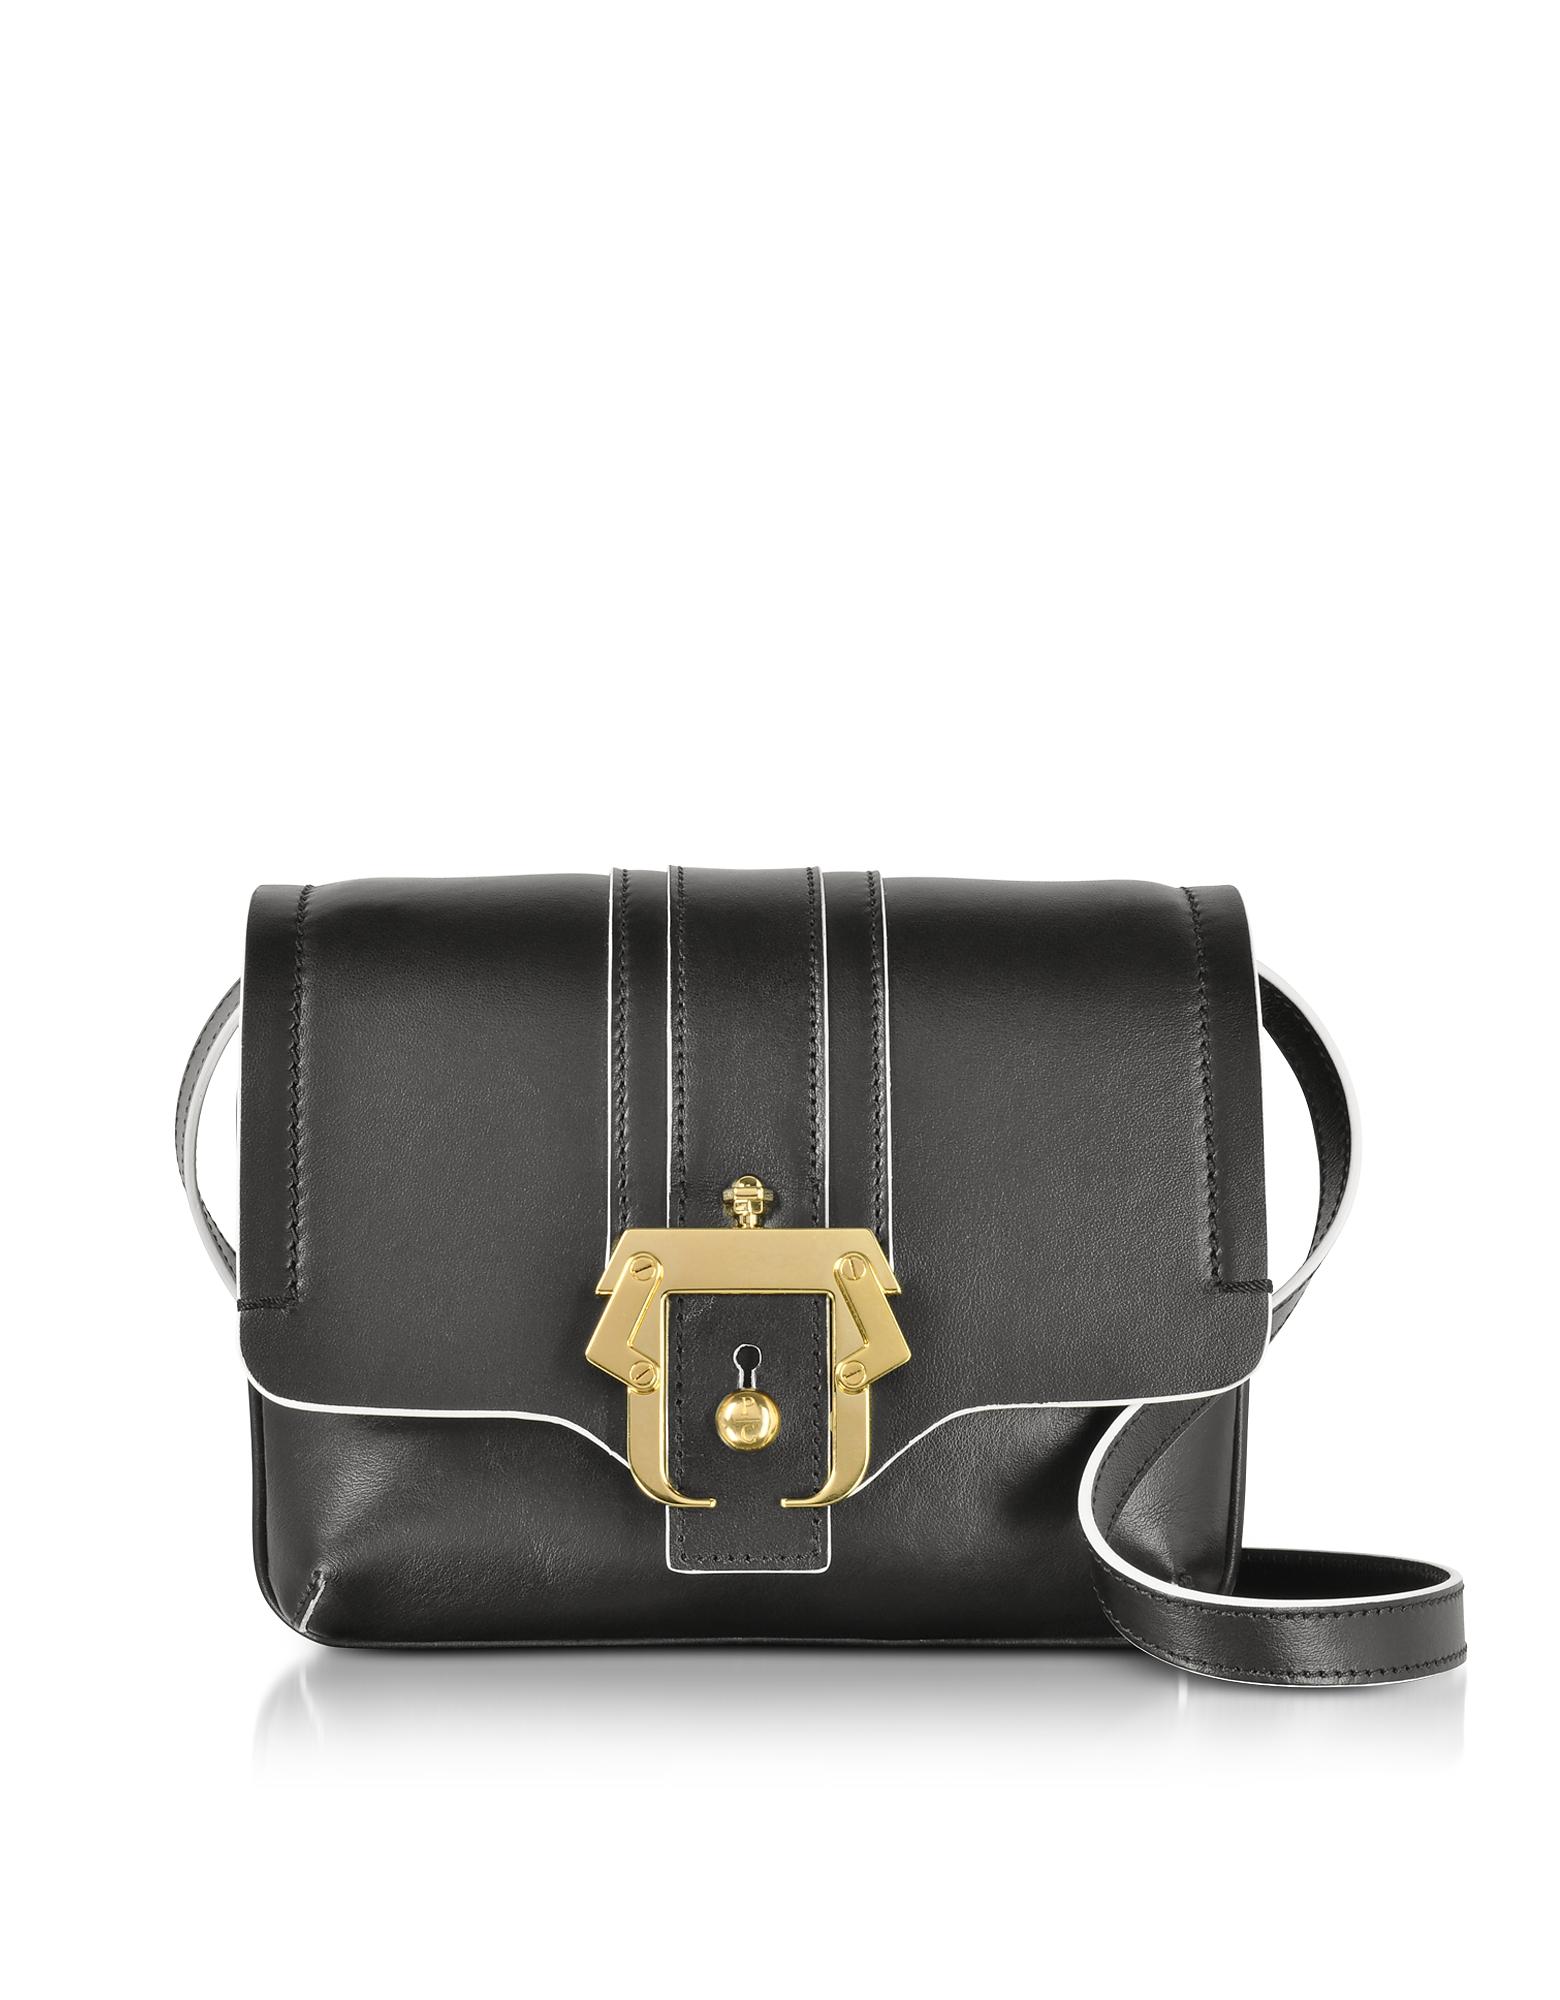 Paula Cademartori Handbags, Black Leather Gigi Crossbody Bag